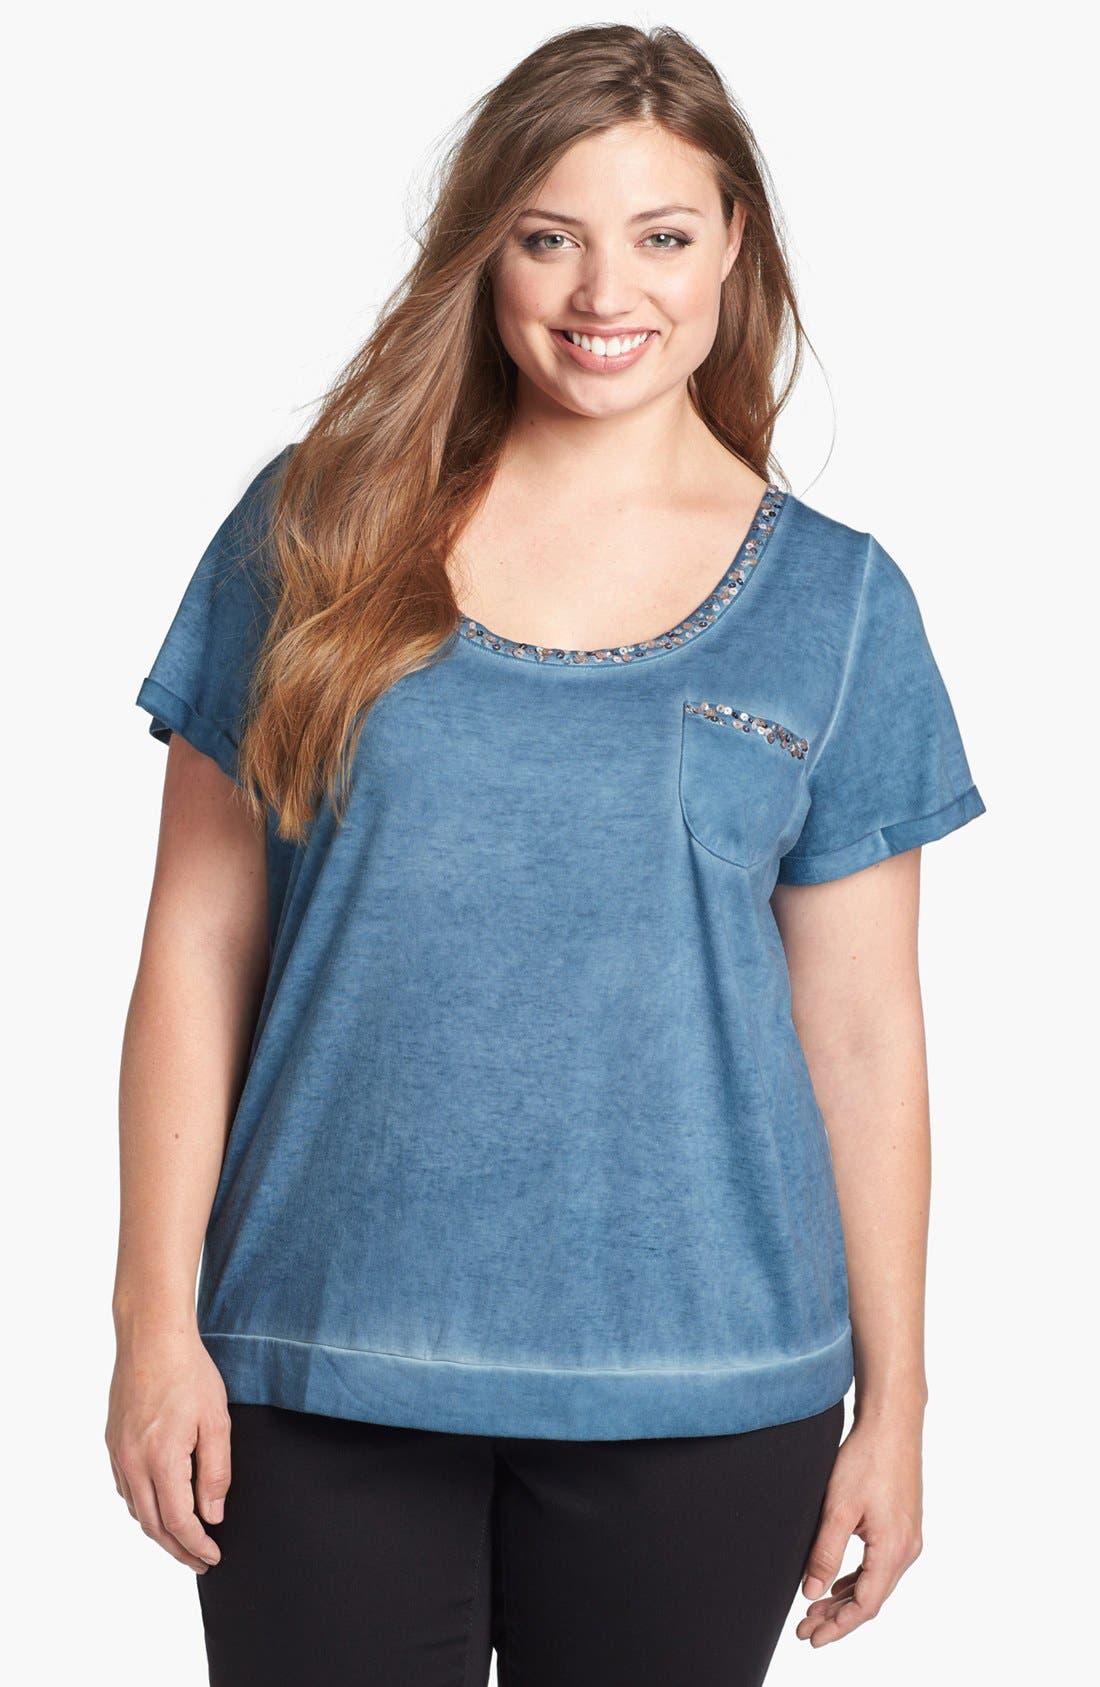 Main Image - Jessica Simpson 'Mona' Embellished Tee (Plus Size)